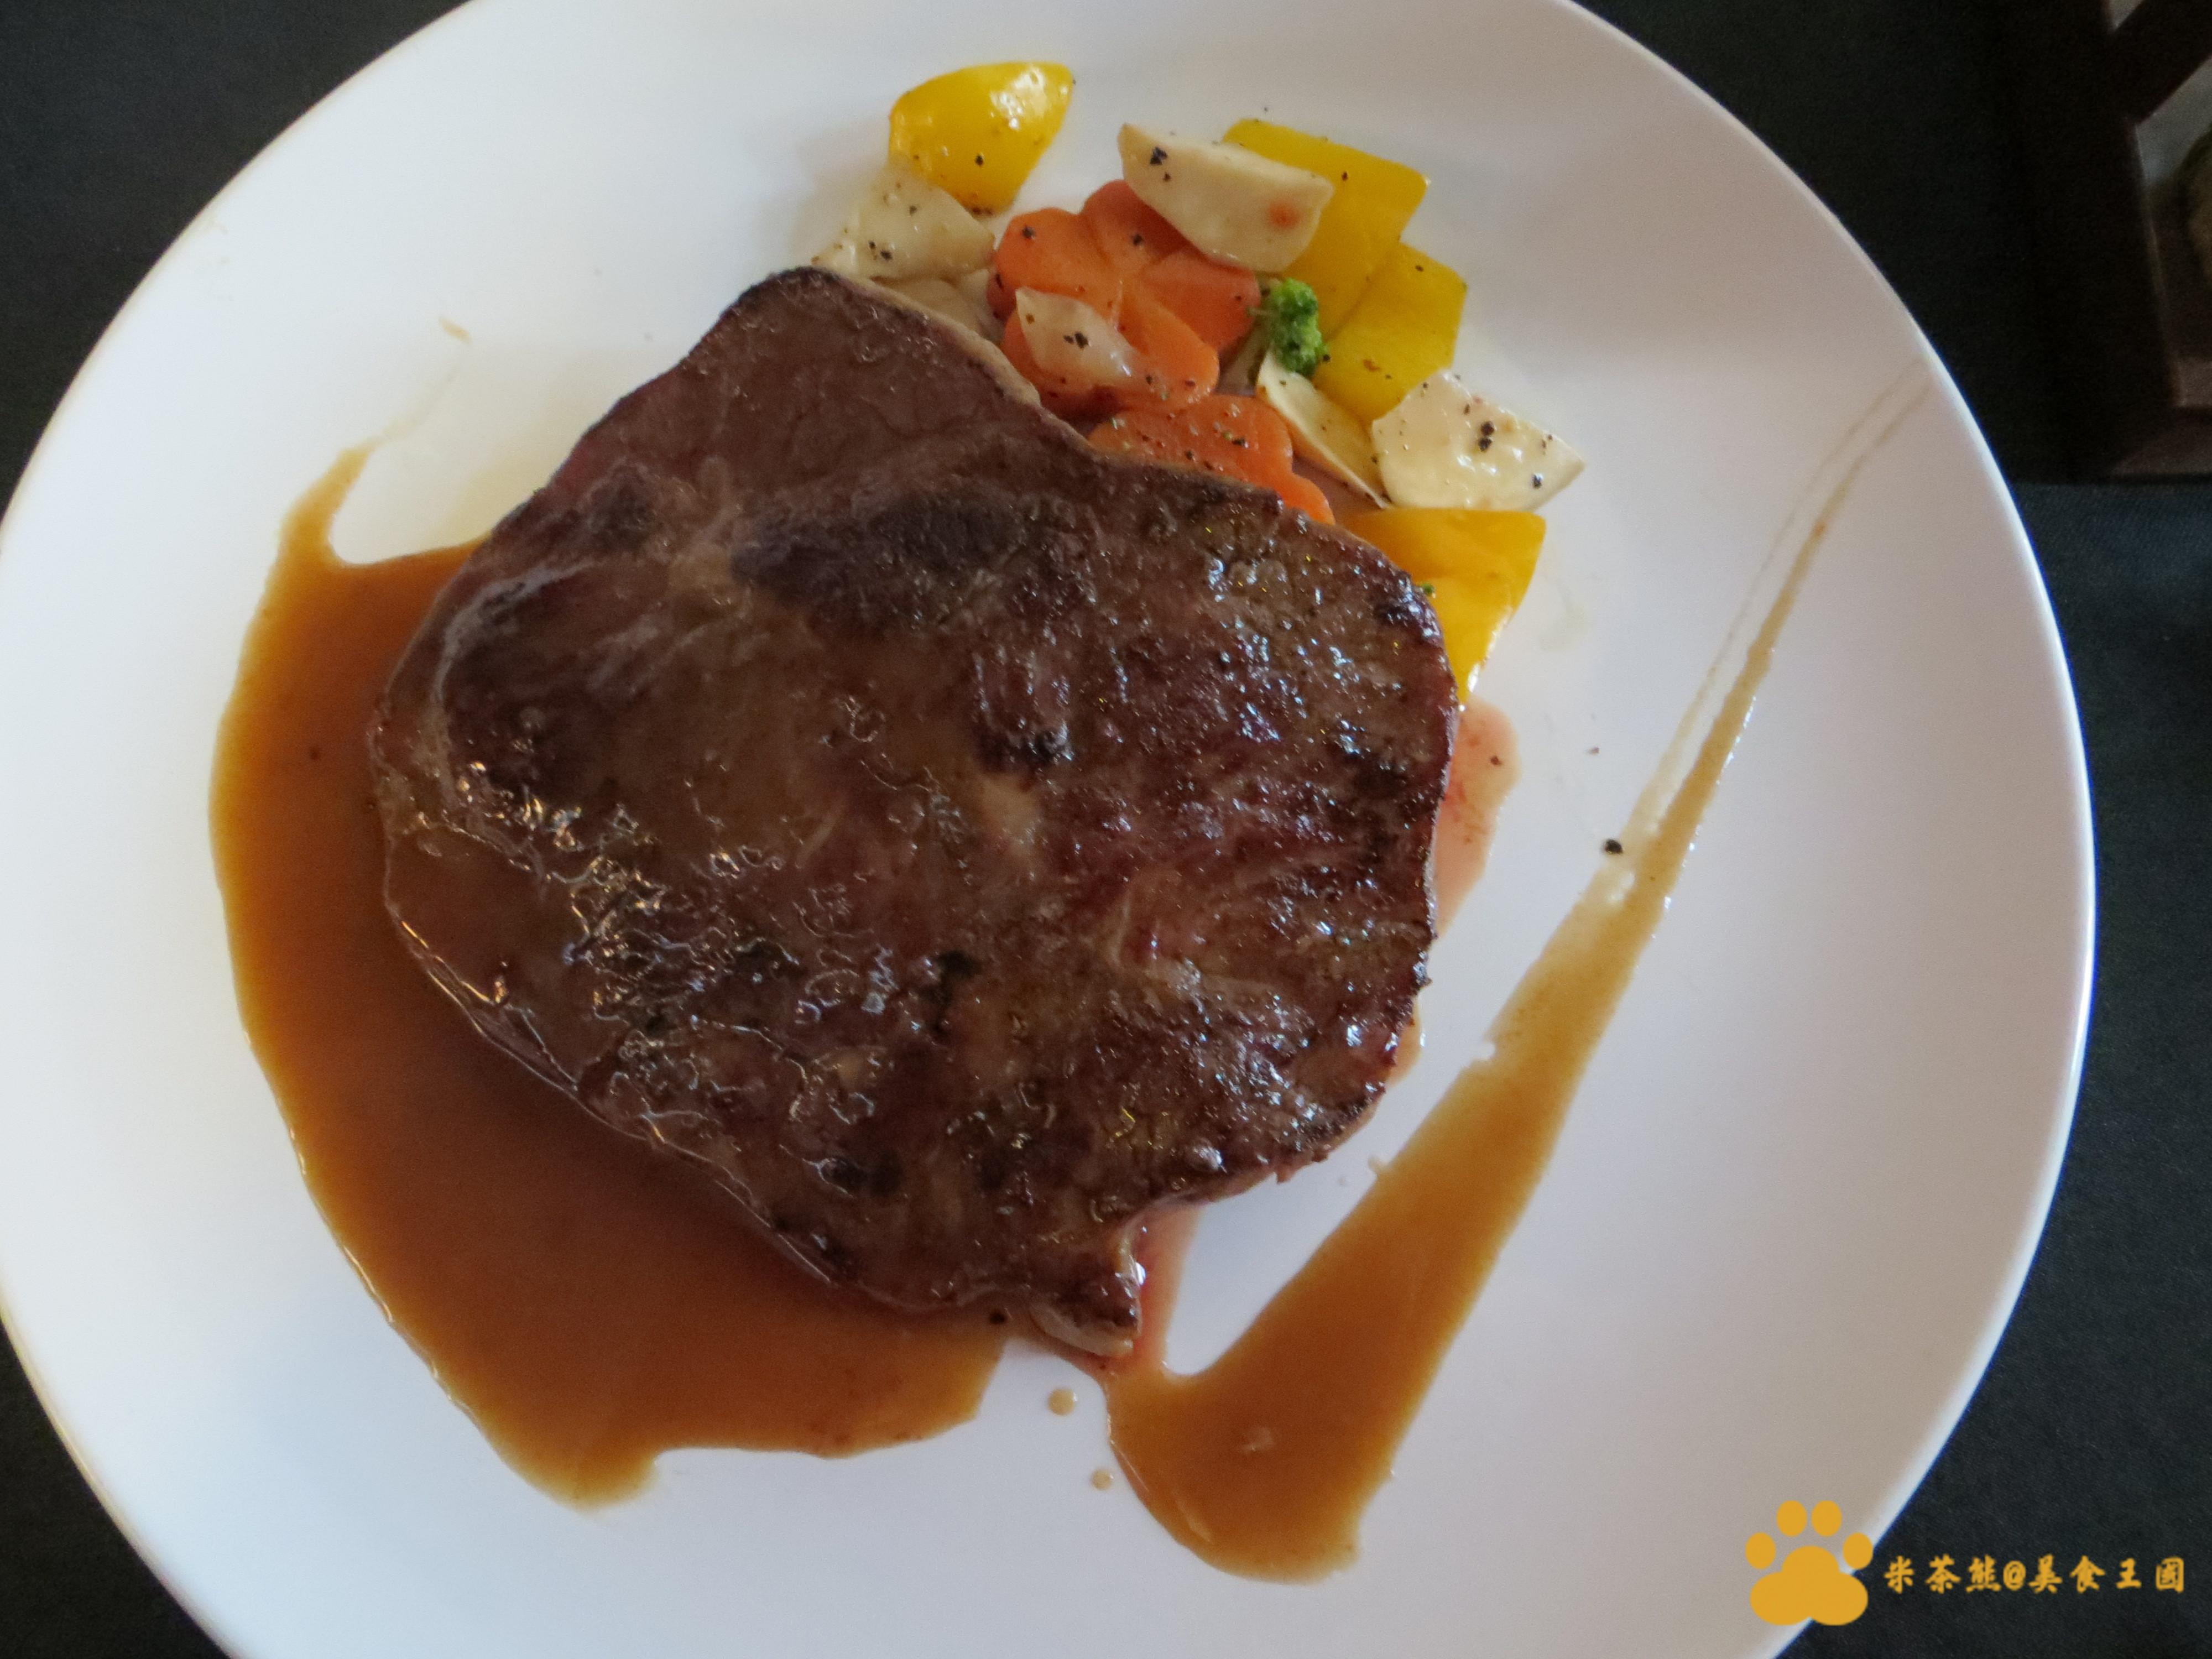 Sicilia 19義式廚房|台北美食︱美食王國